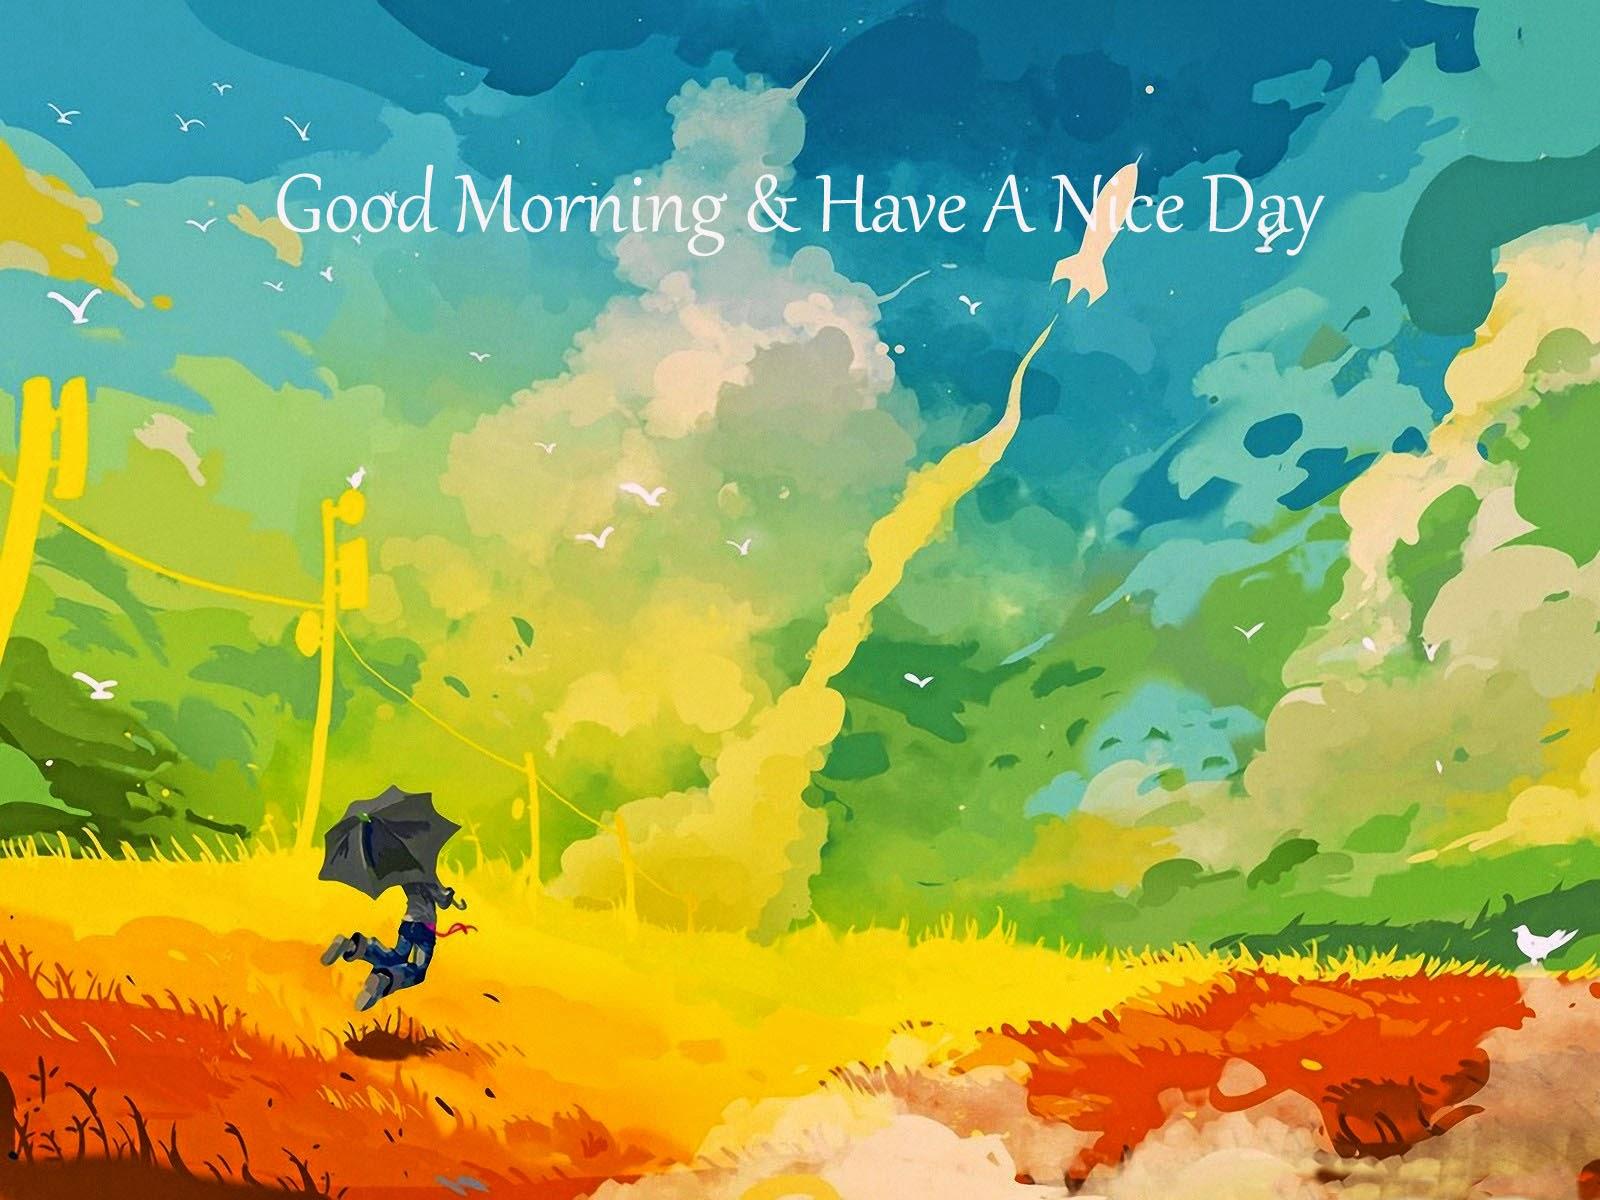 Download-free-hd-Good-morning-wallpaper